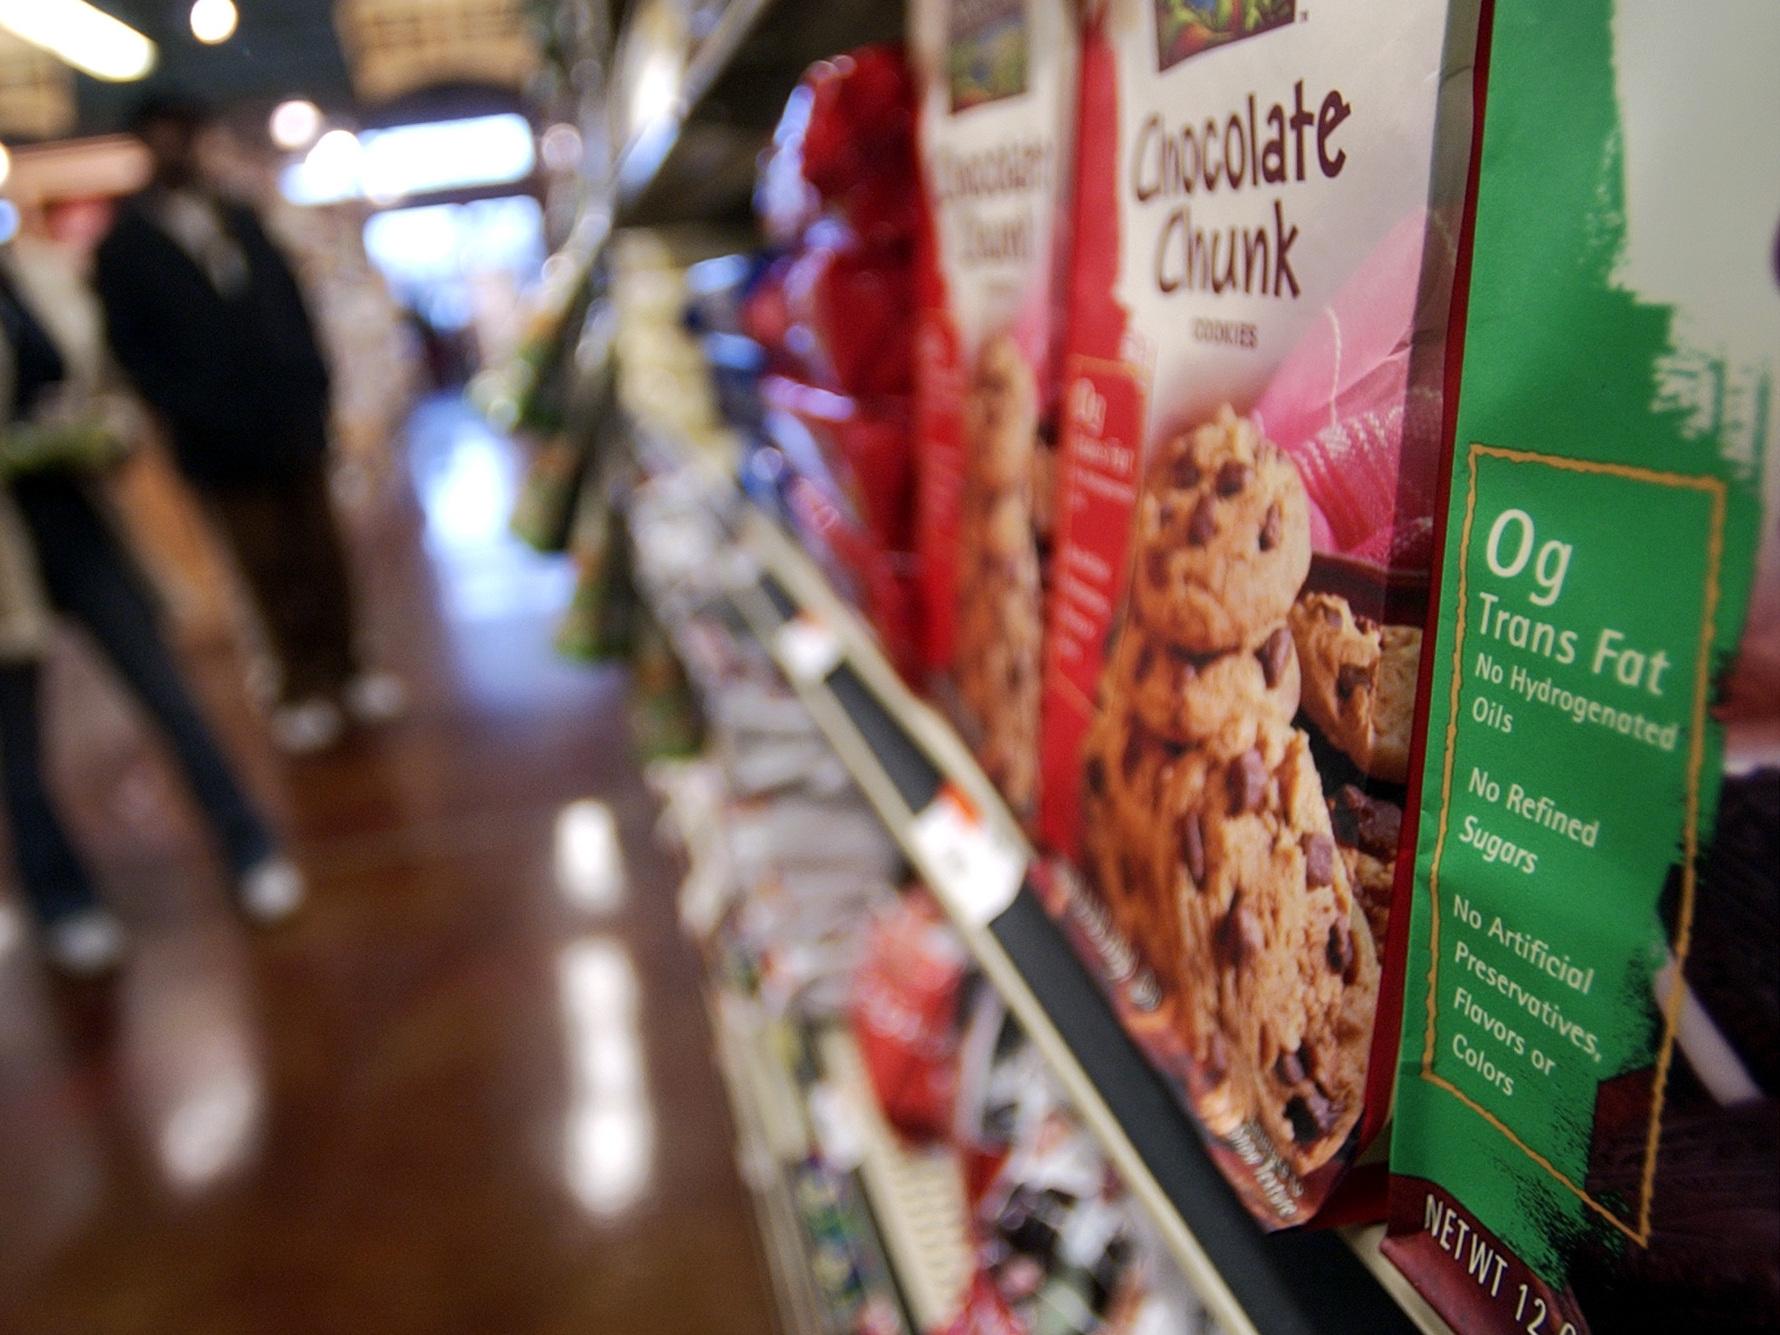 When Zero Doesn't Mean Zero: Trans Fats Linger In Food